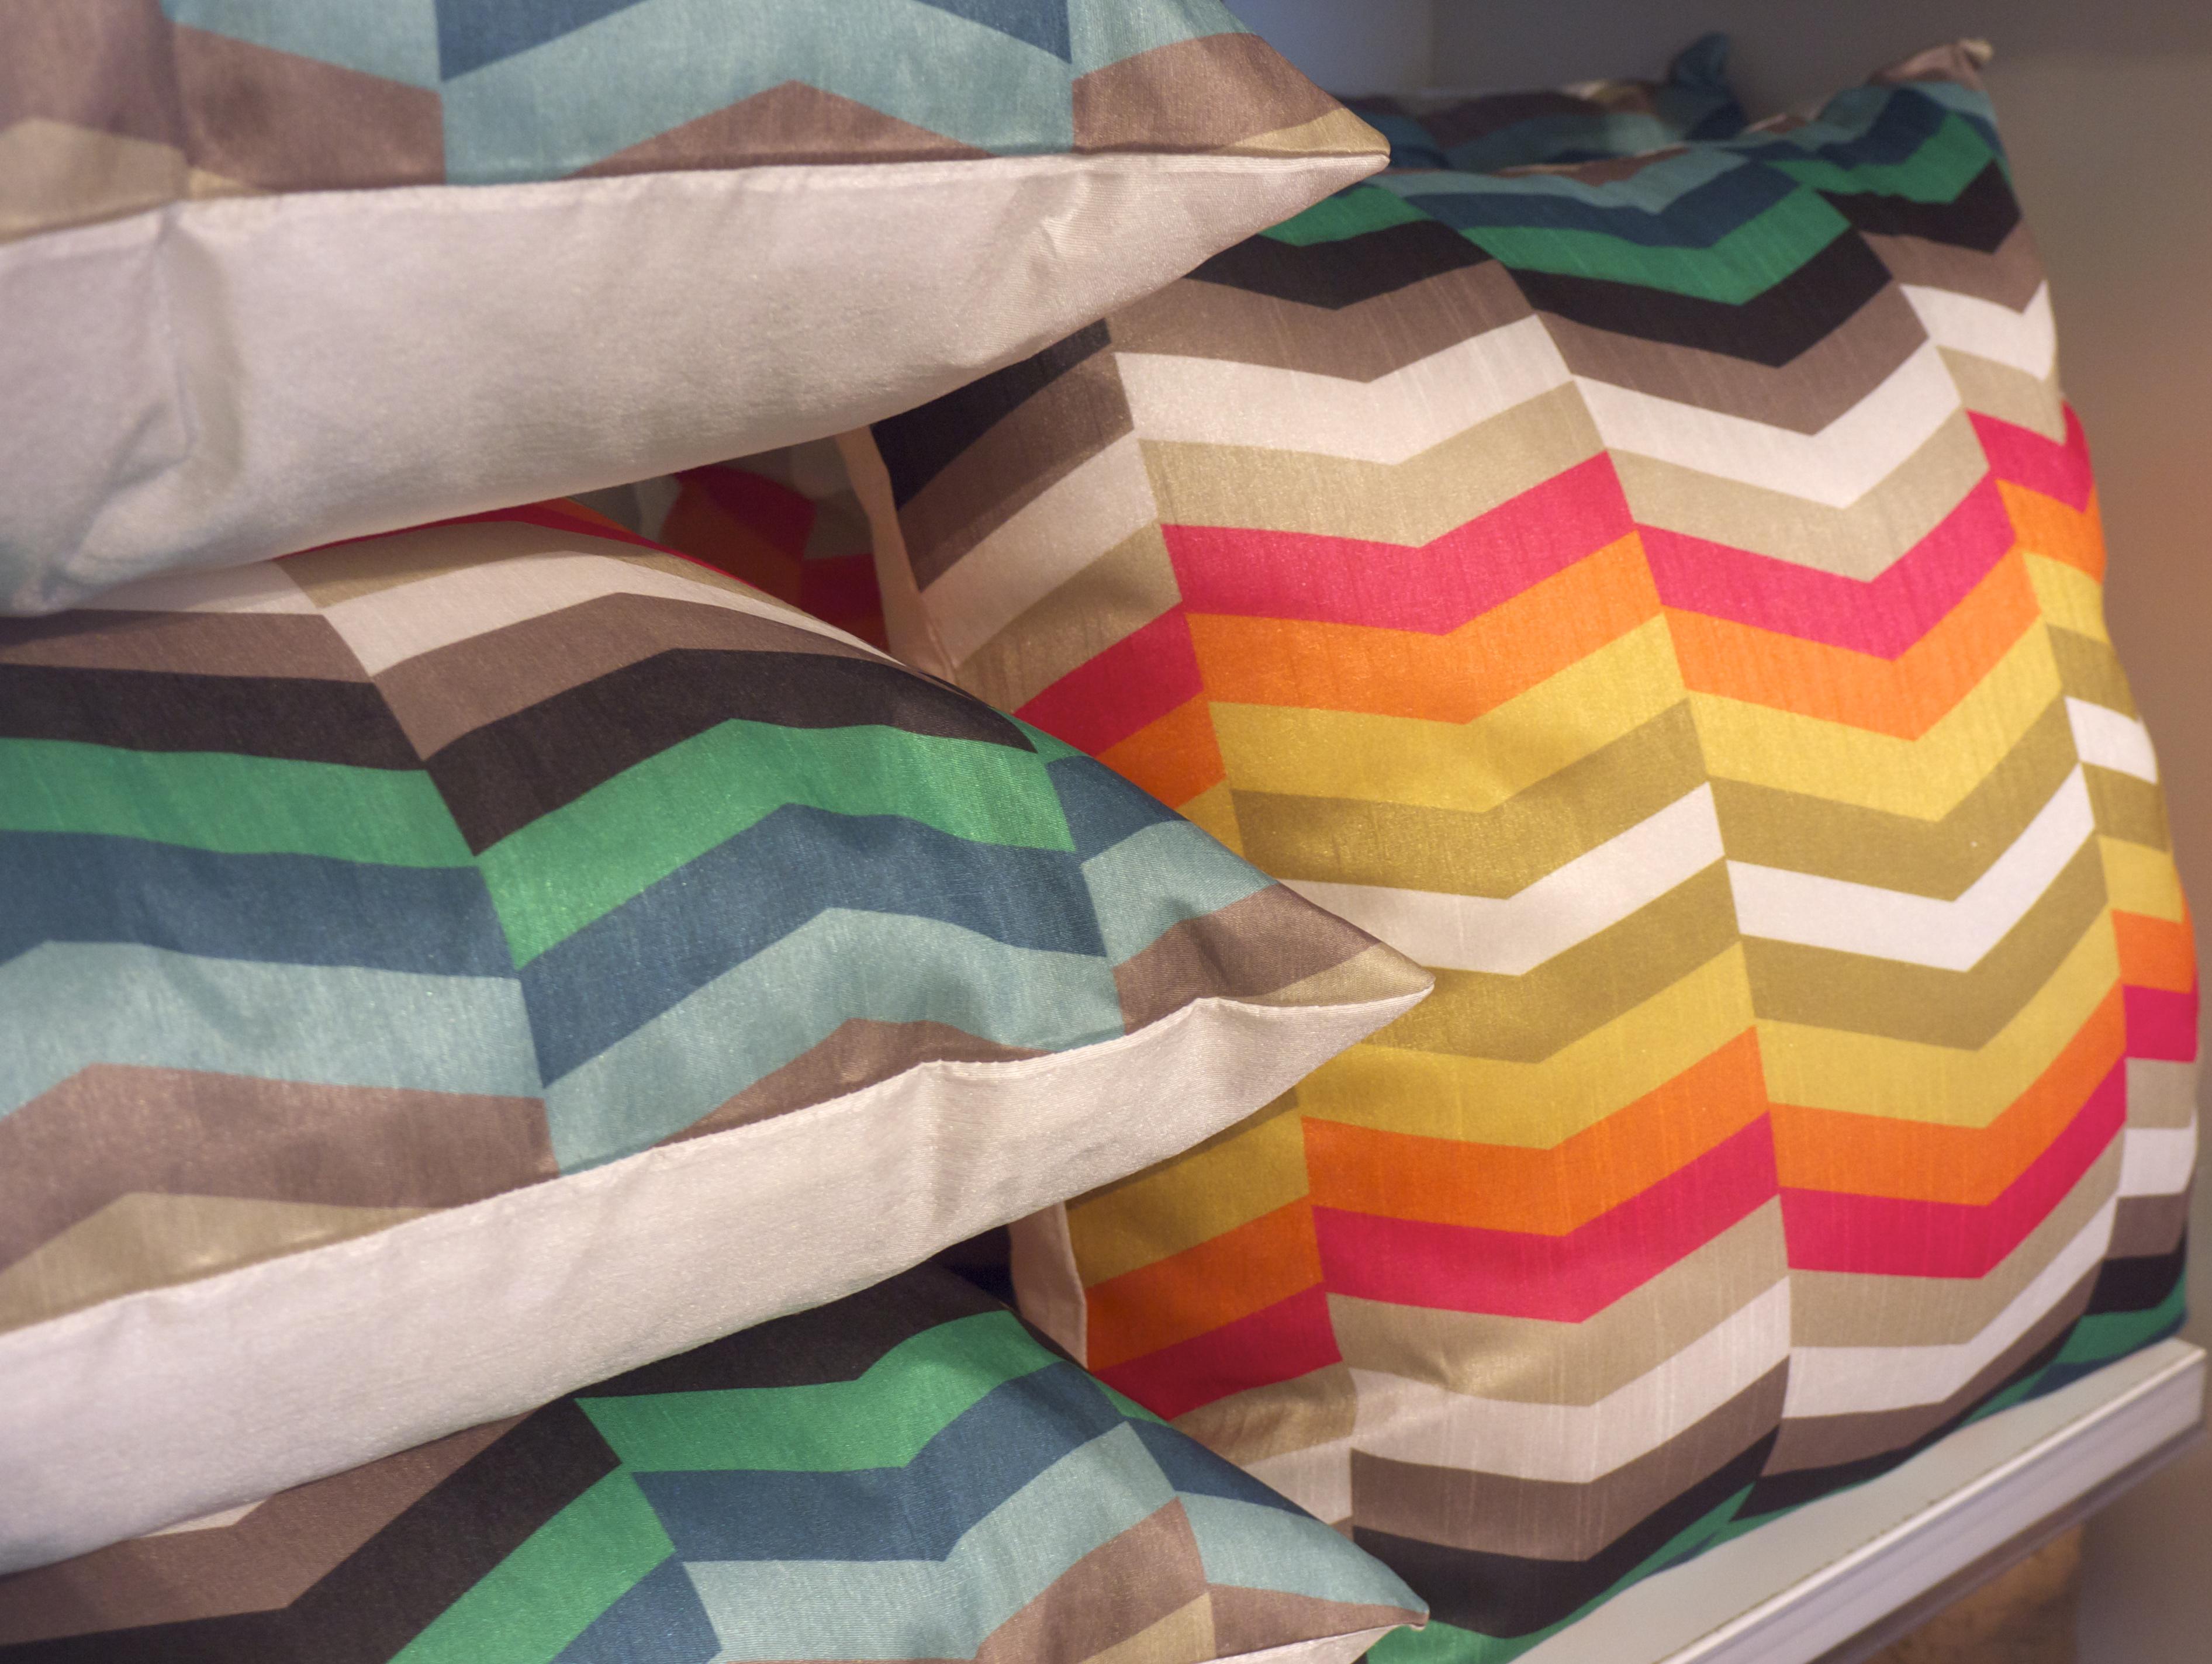 Freedom Top Ryde - Colourful Chevron Cushions